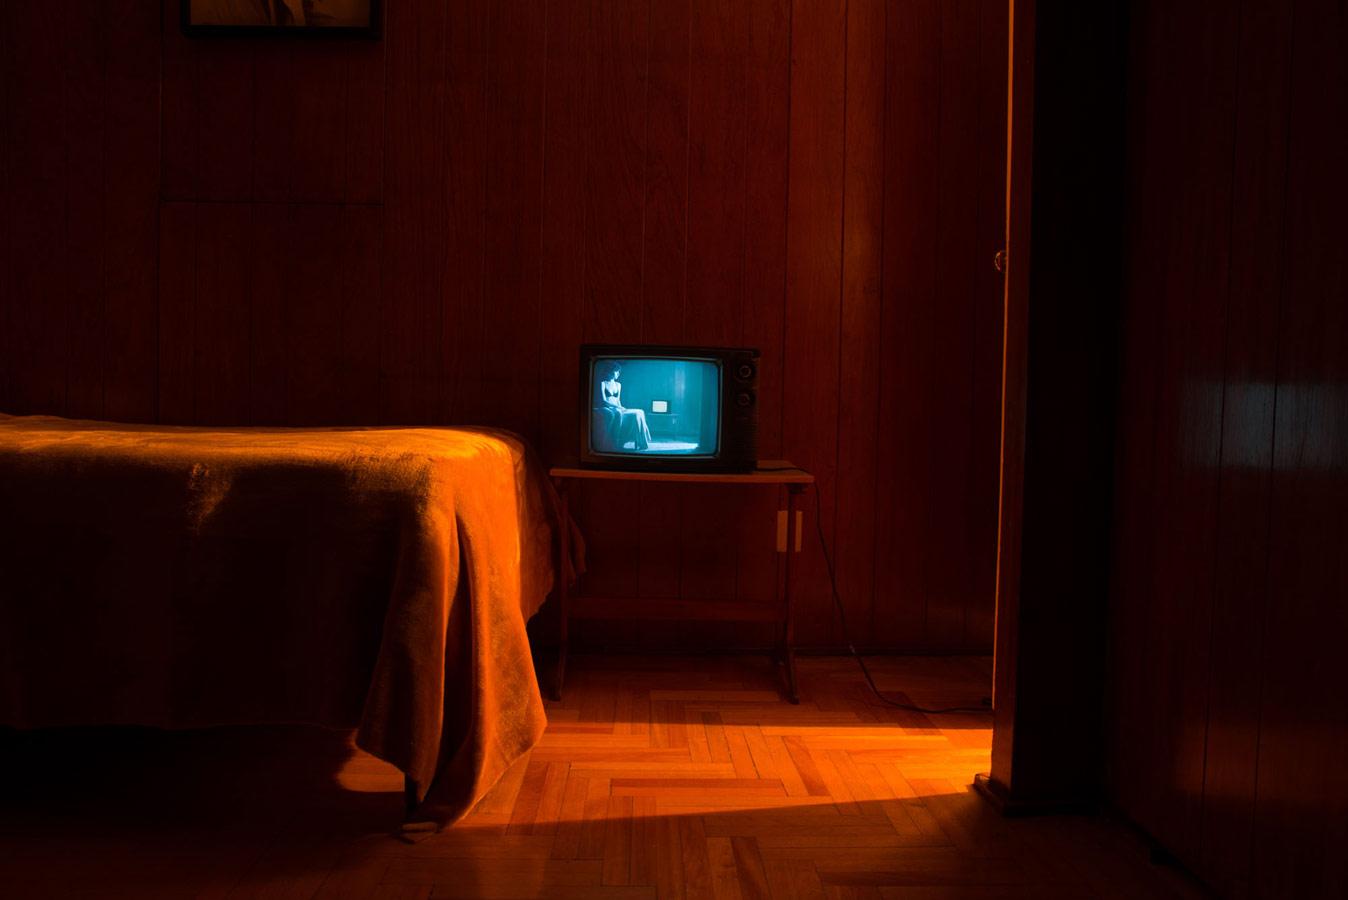 Таня Франко Клейн, Мексика / Tania Franco Klein, Mexico, Национальная премия, Фотоконкурс Sony World Photography Awards 2017